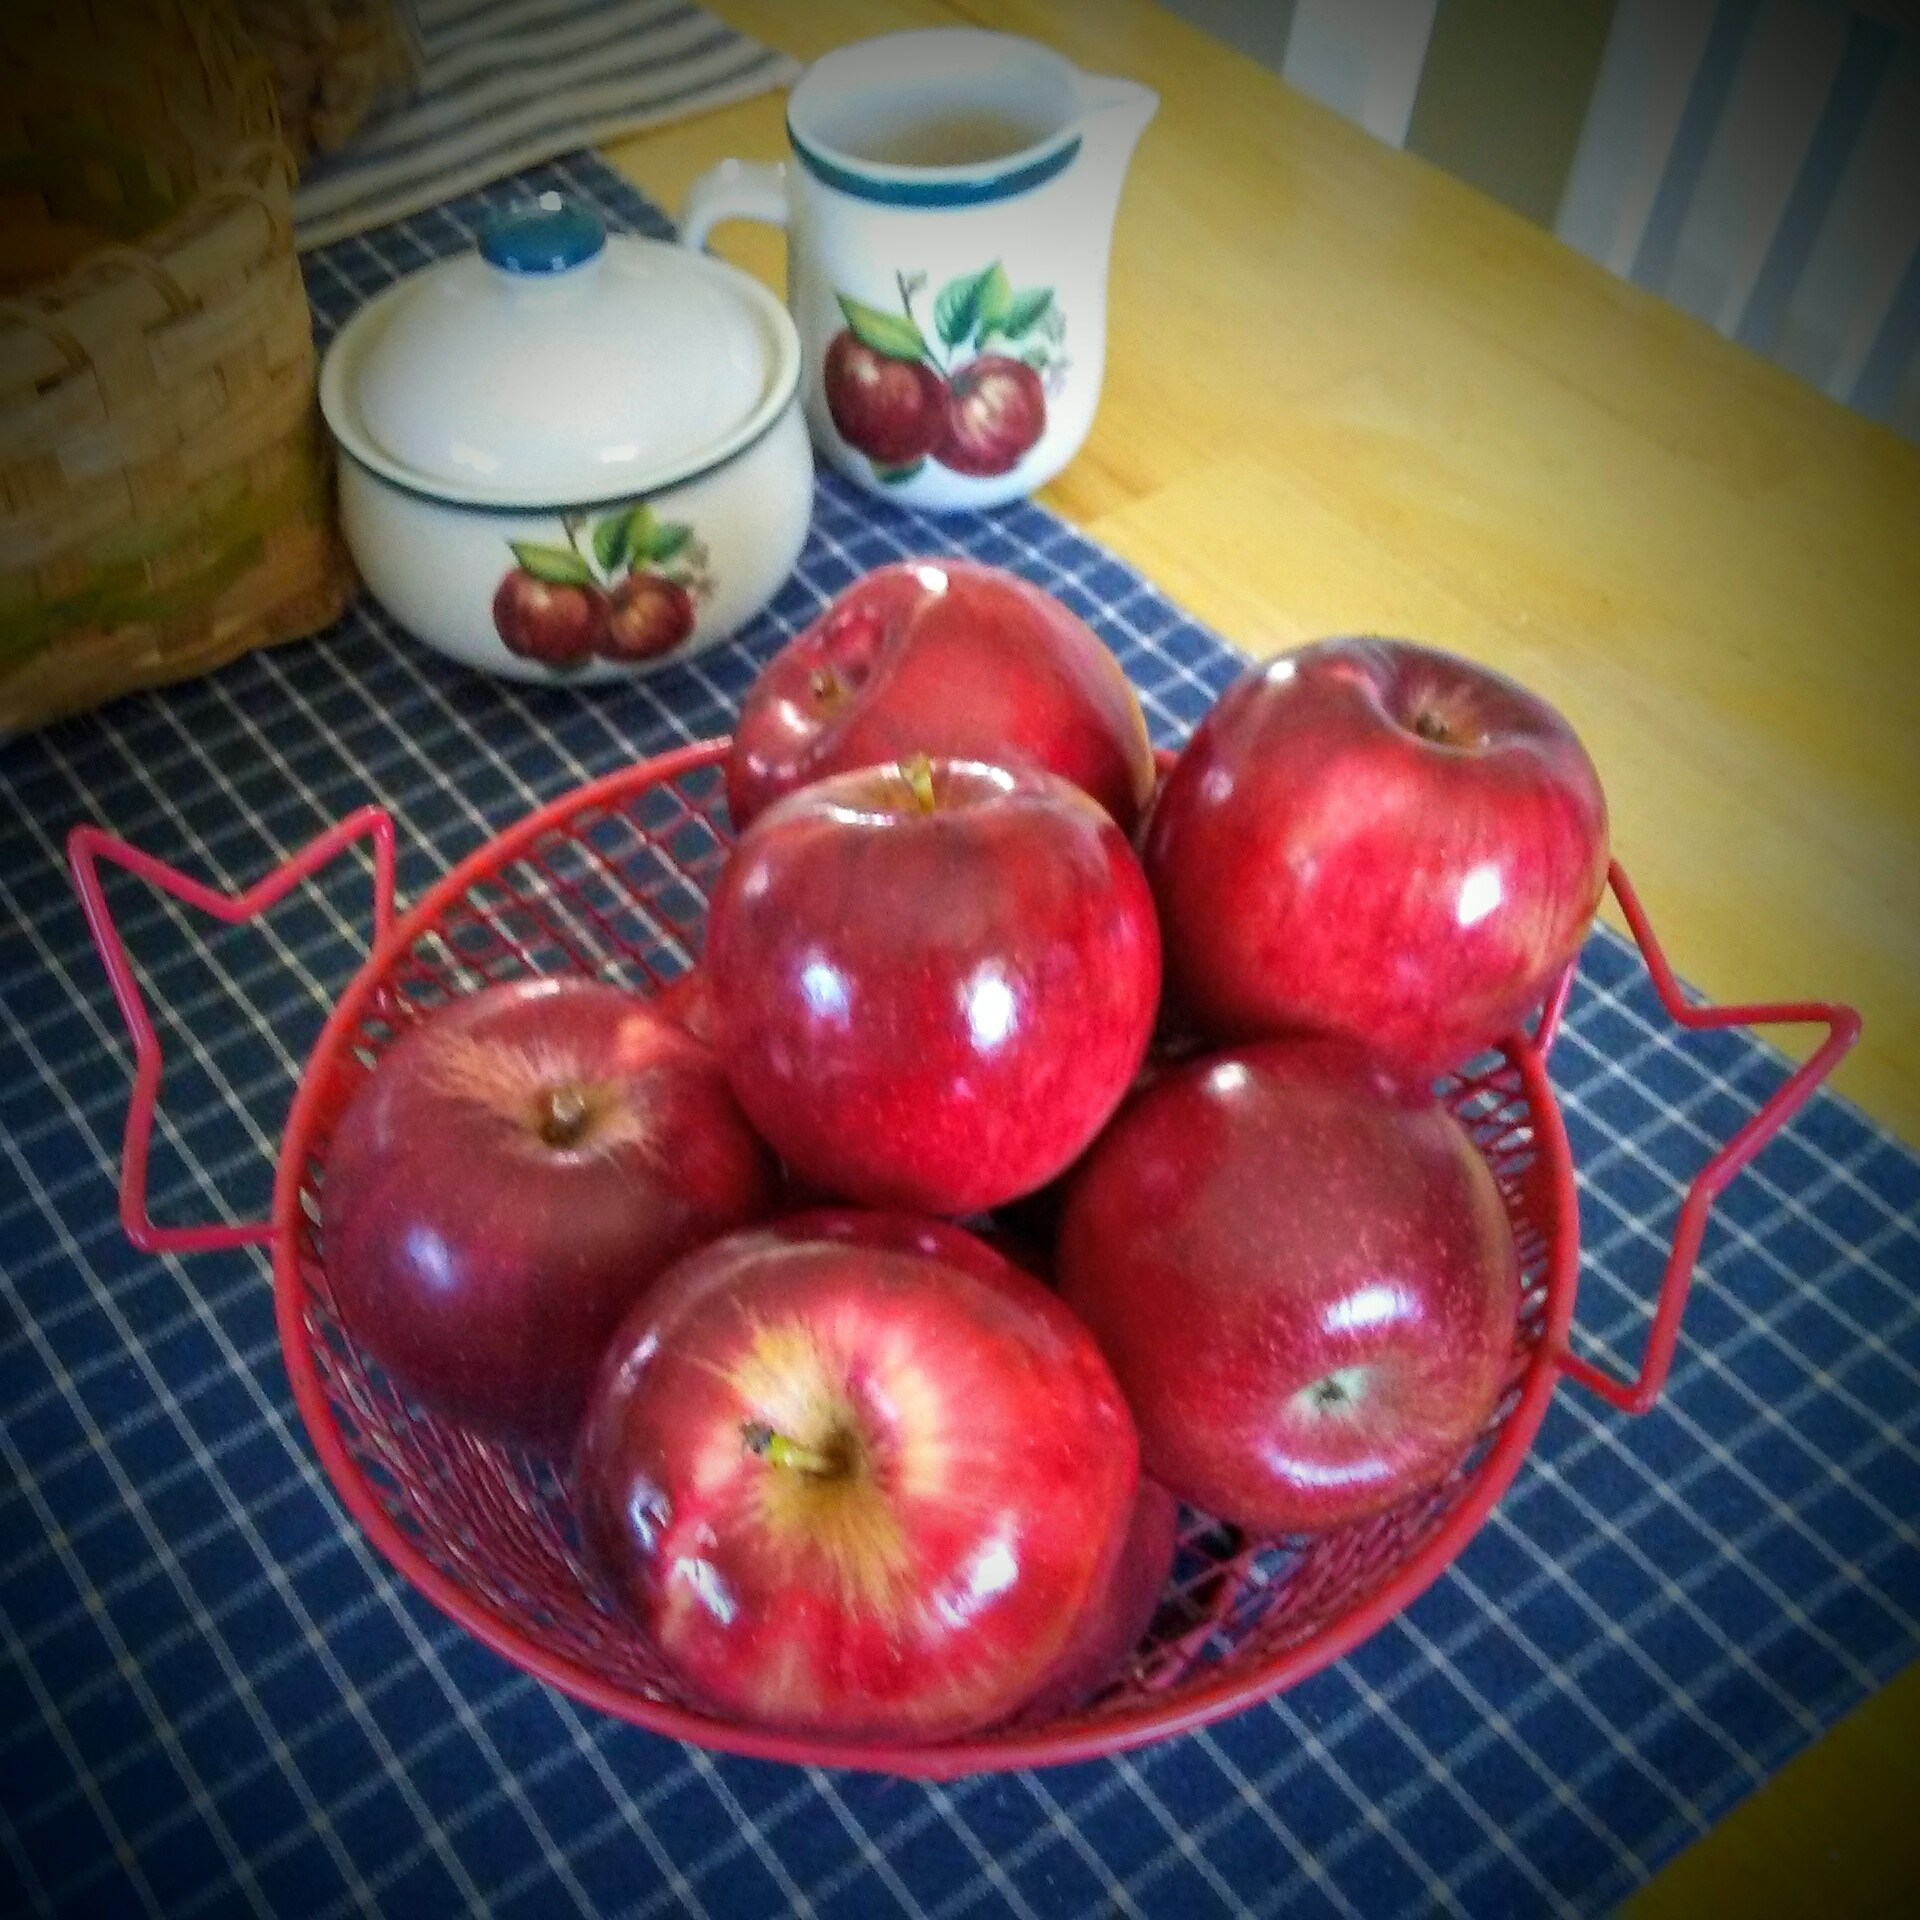 Apple Still life by Tammy Dyer